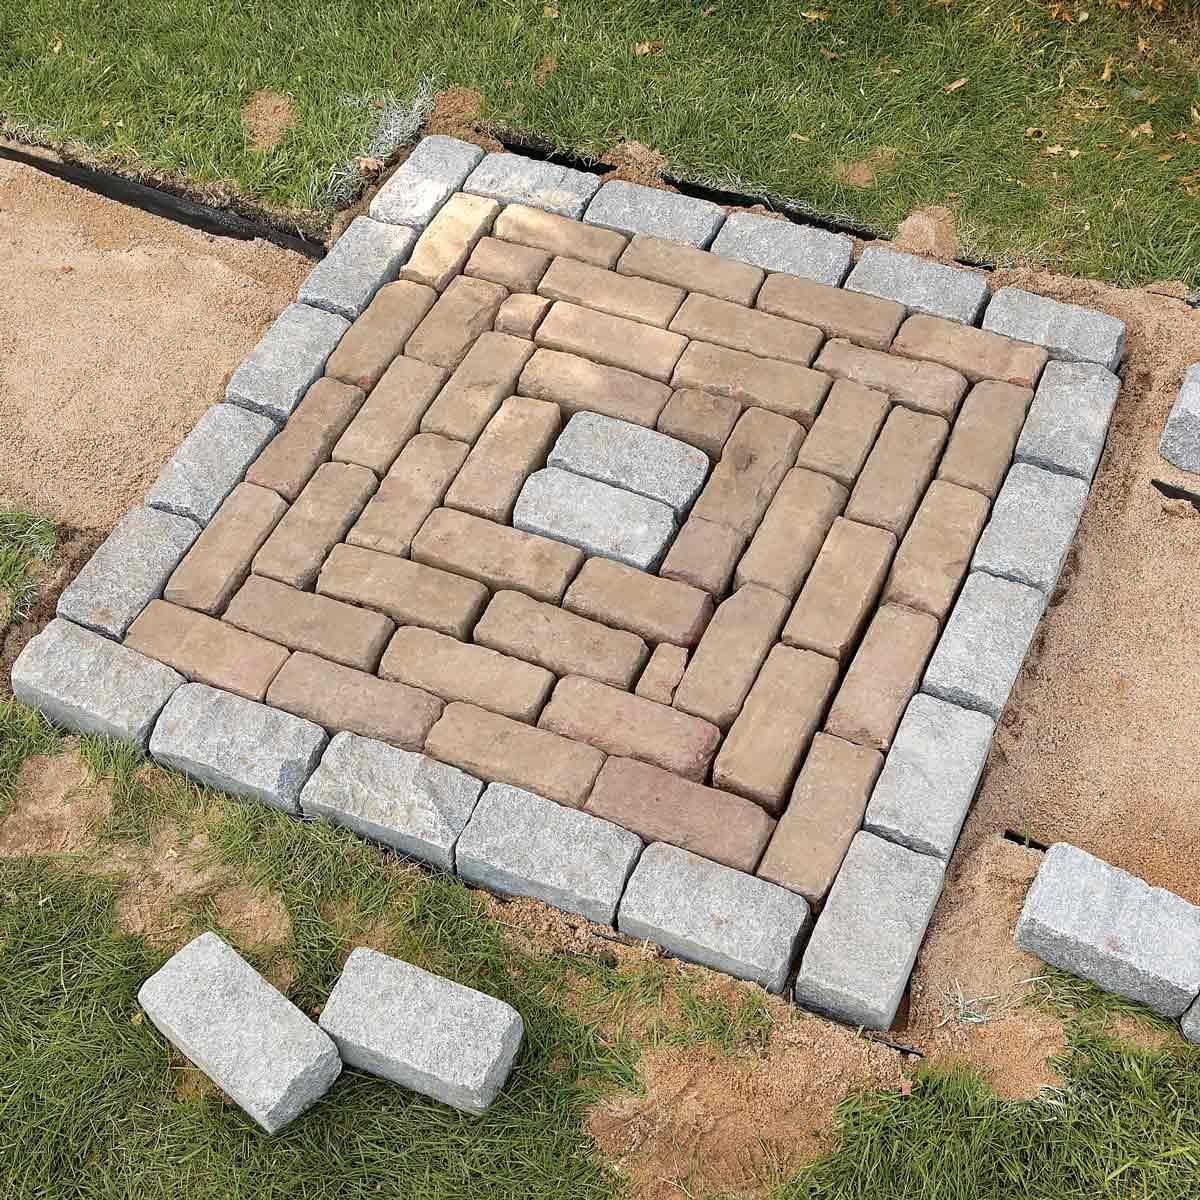 Seating area brick path